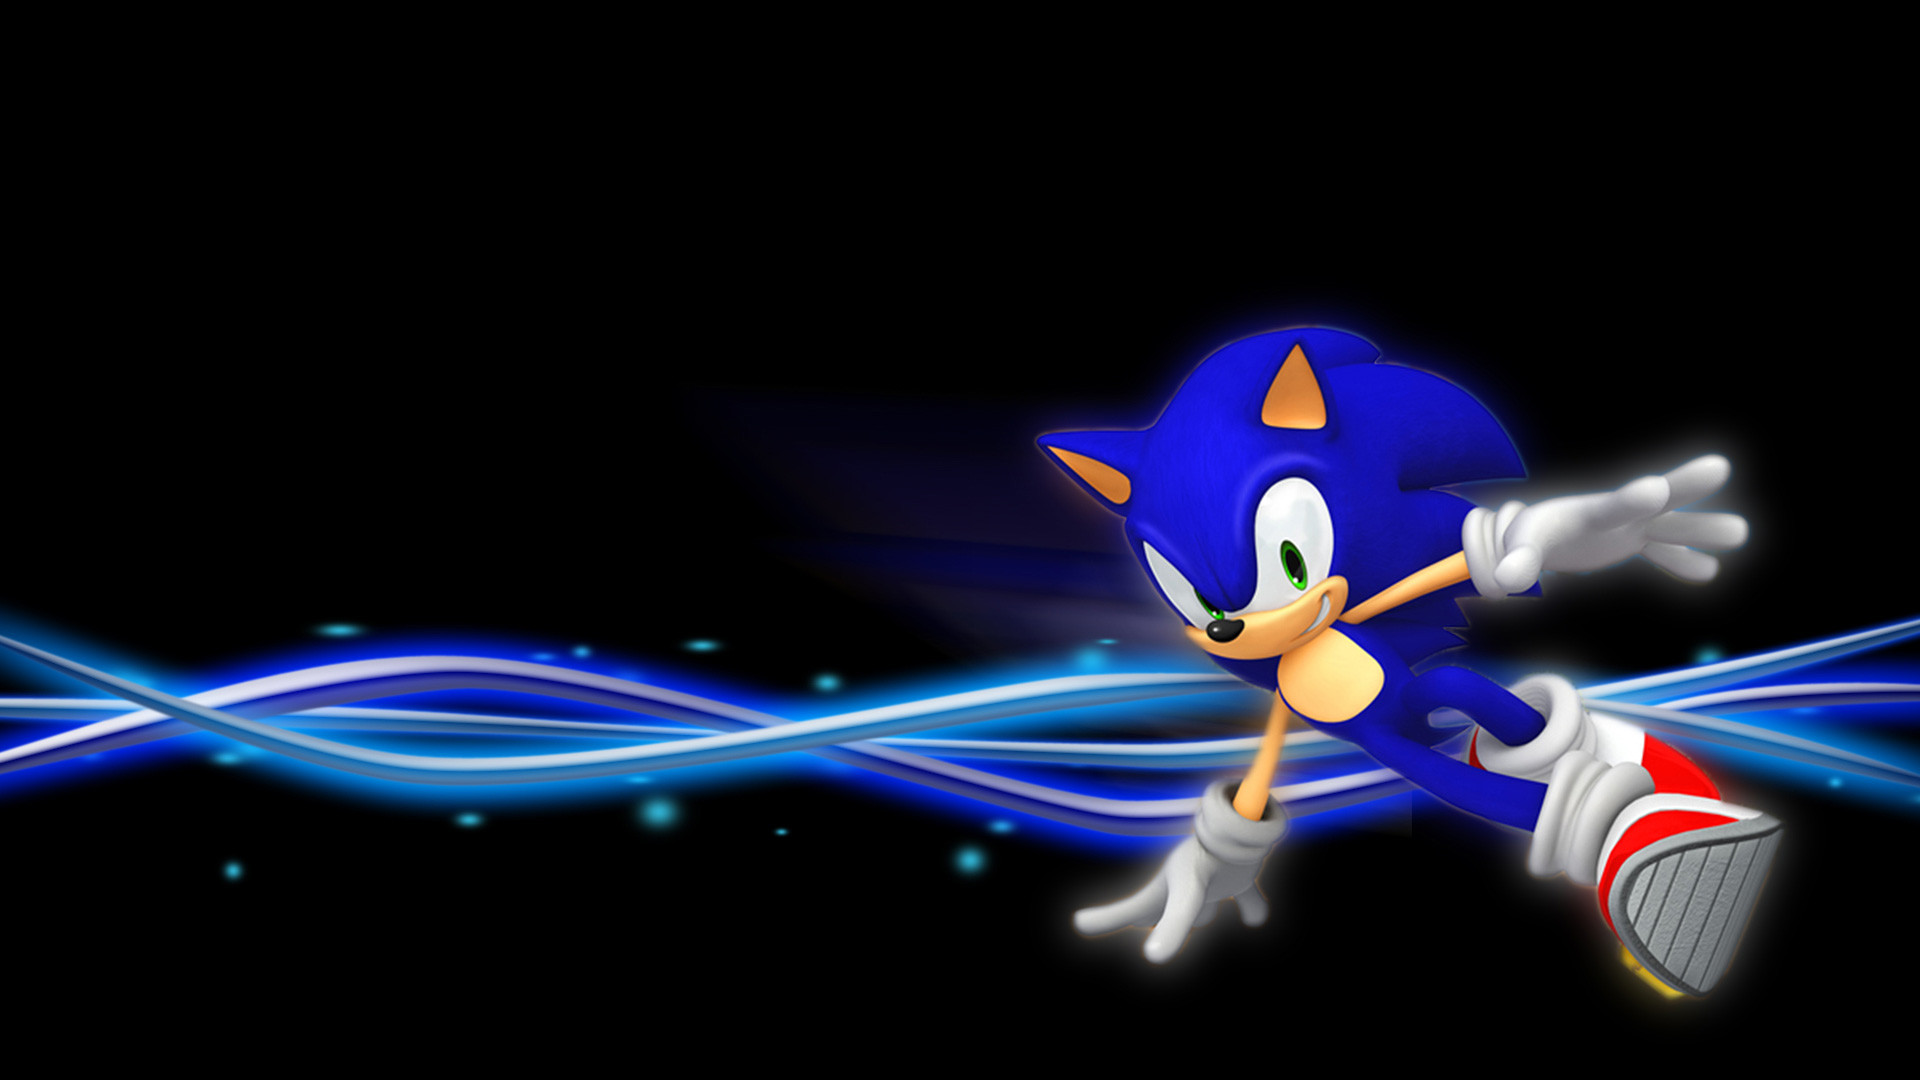 Retro Sonic Wallpaper, wallpaper, Retro Sonic Wallpaper hd wallpaper .